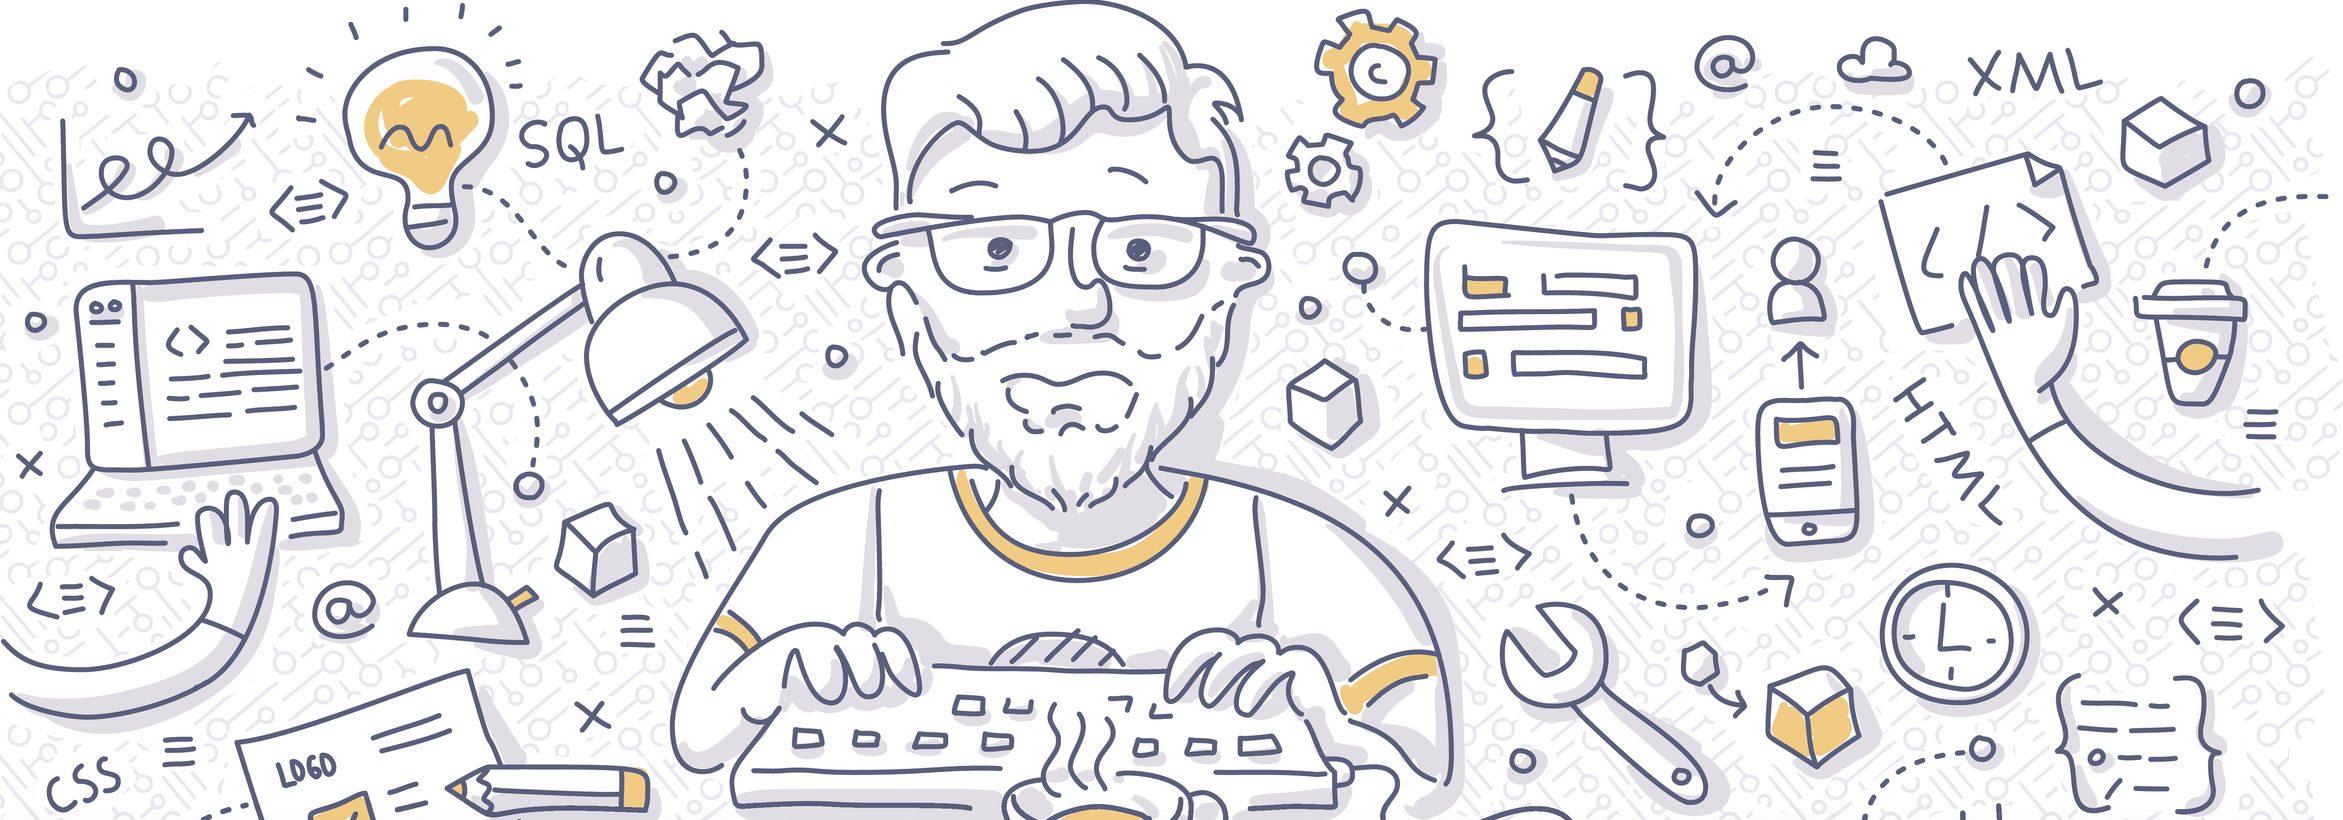 Doodle vector illustration of web developer creating website, client web application, interface. Front-end development concept for web banner, hero image, printed material